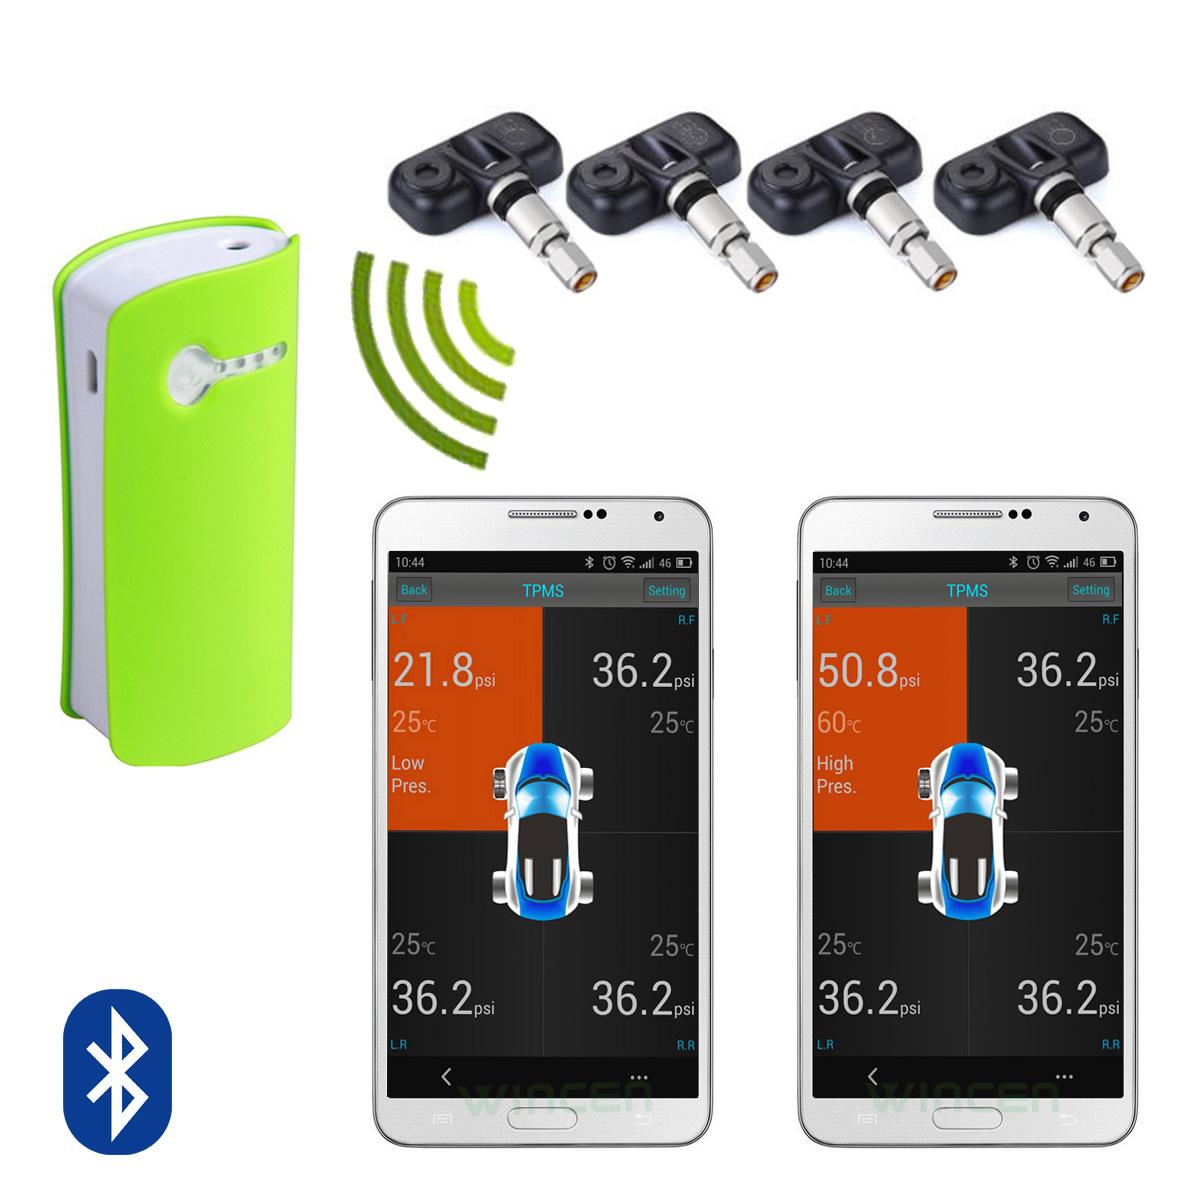 Cảm biến áp suất lốp X6 cho điện thoại IOS và Adroid (bluetooth 4.0)